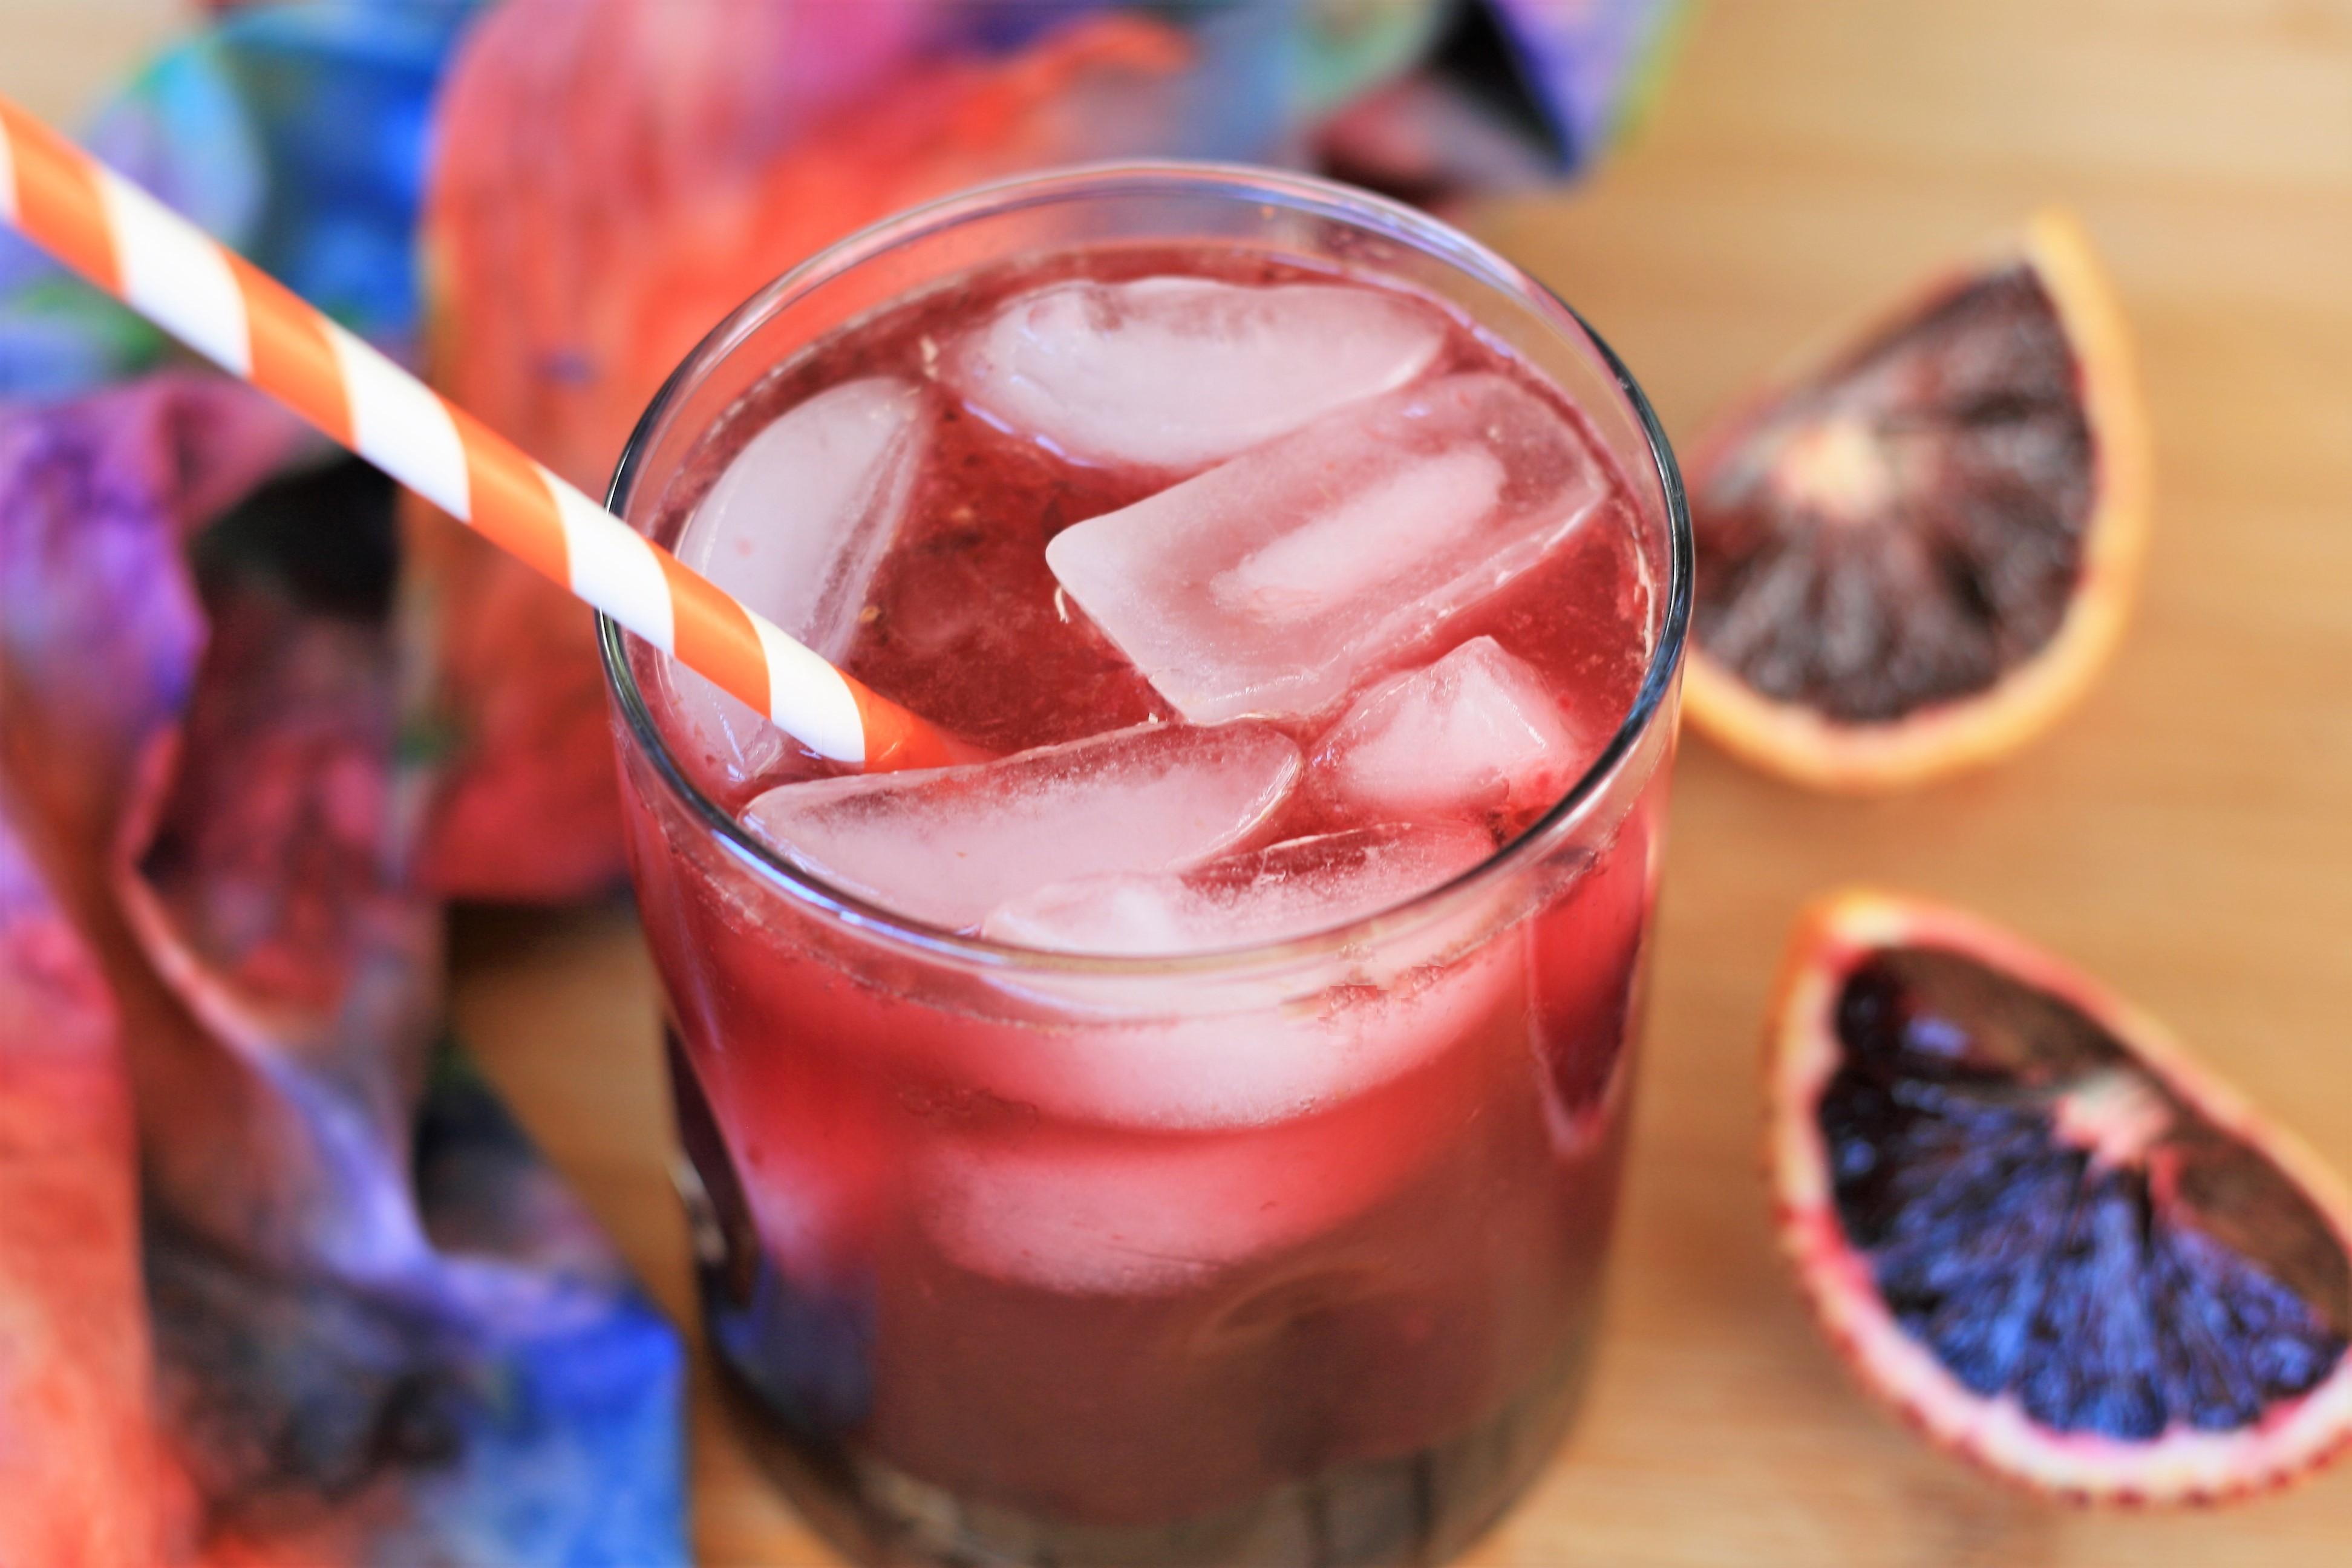 Sparkling Blood Orange Juice